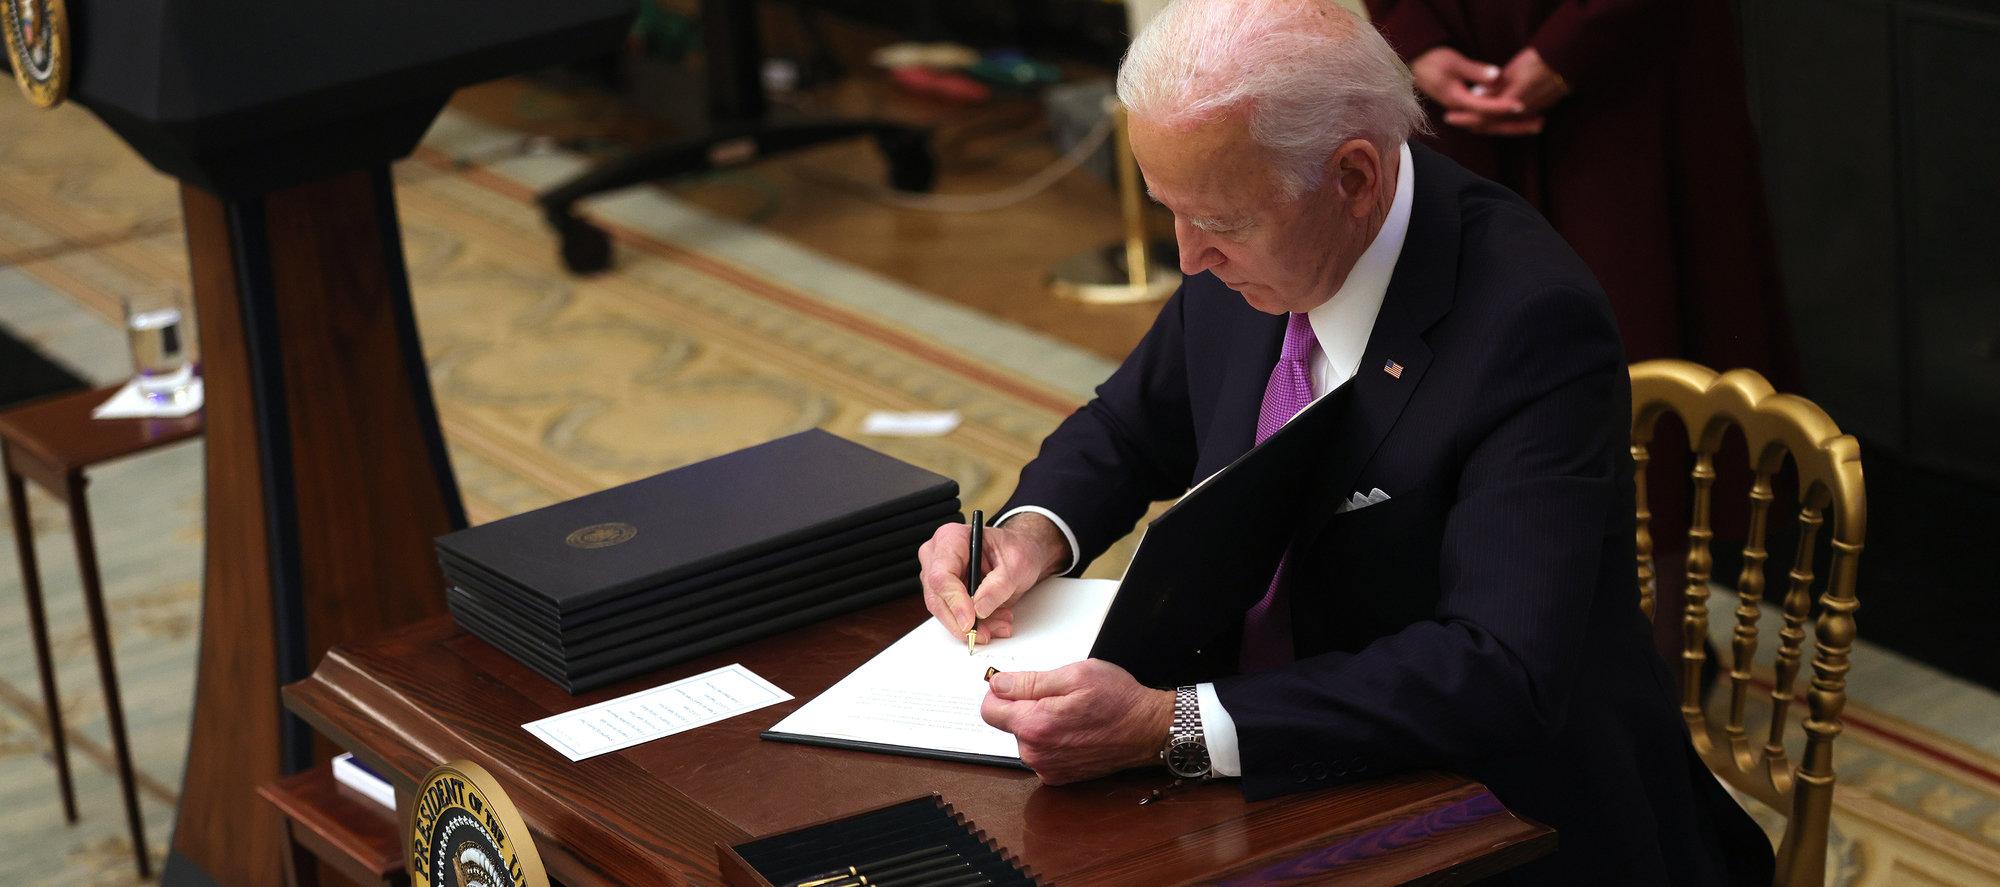 President Joe Biden signs an executive order at the White House in Washington, on Jan. 21.